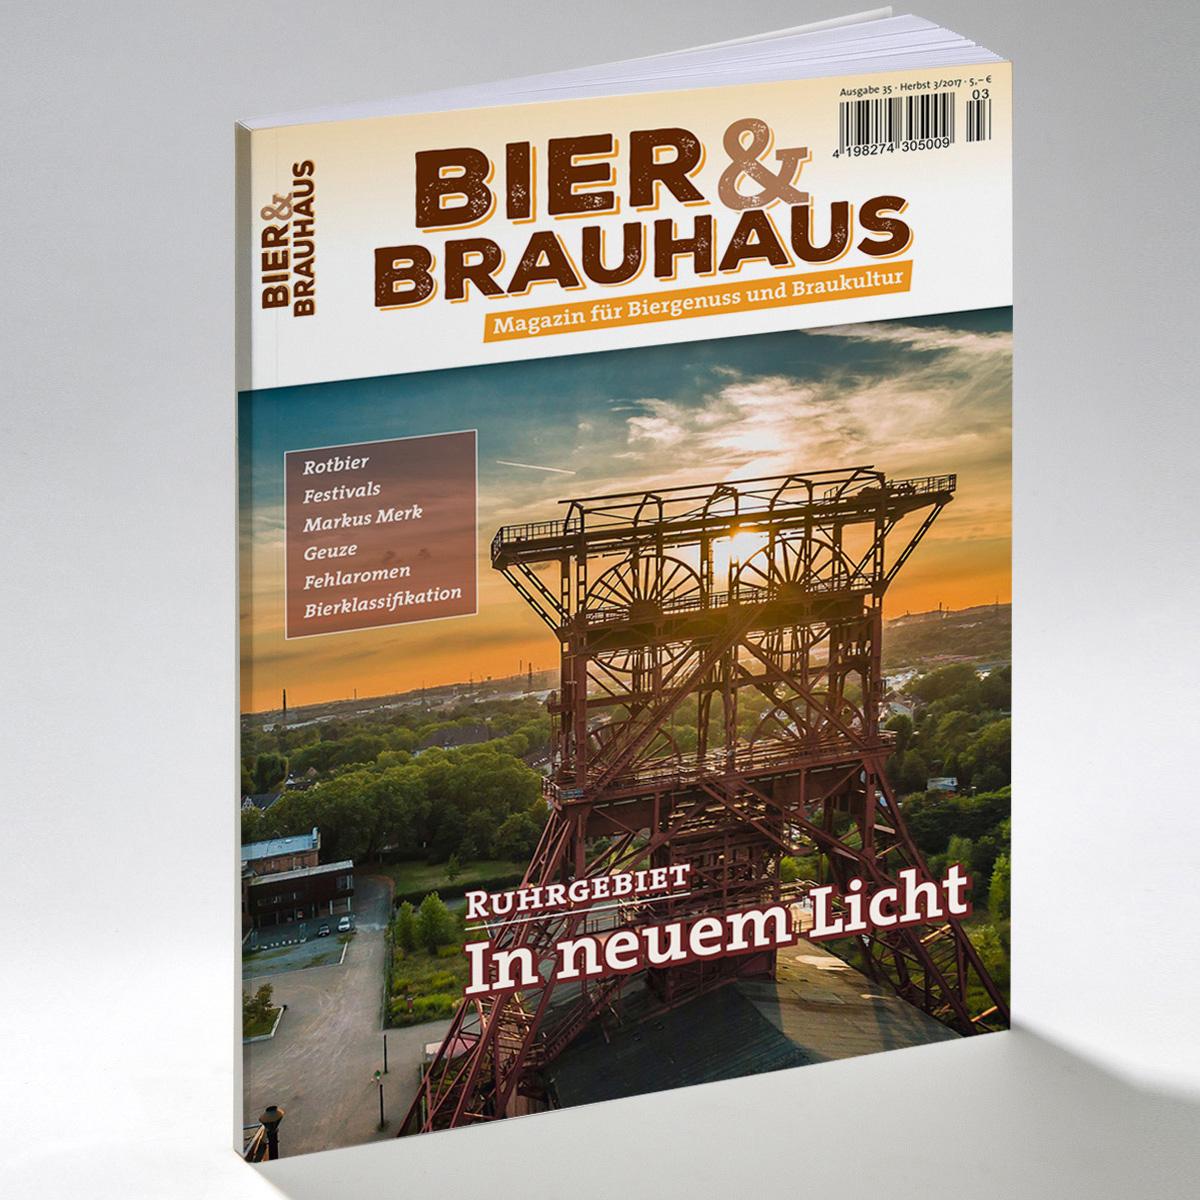 Biermagazin Bier & Brauhaus